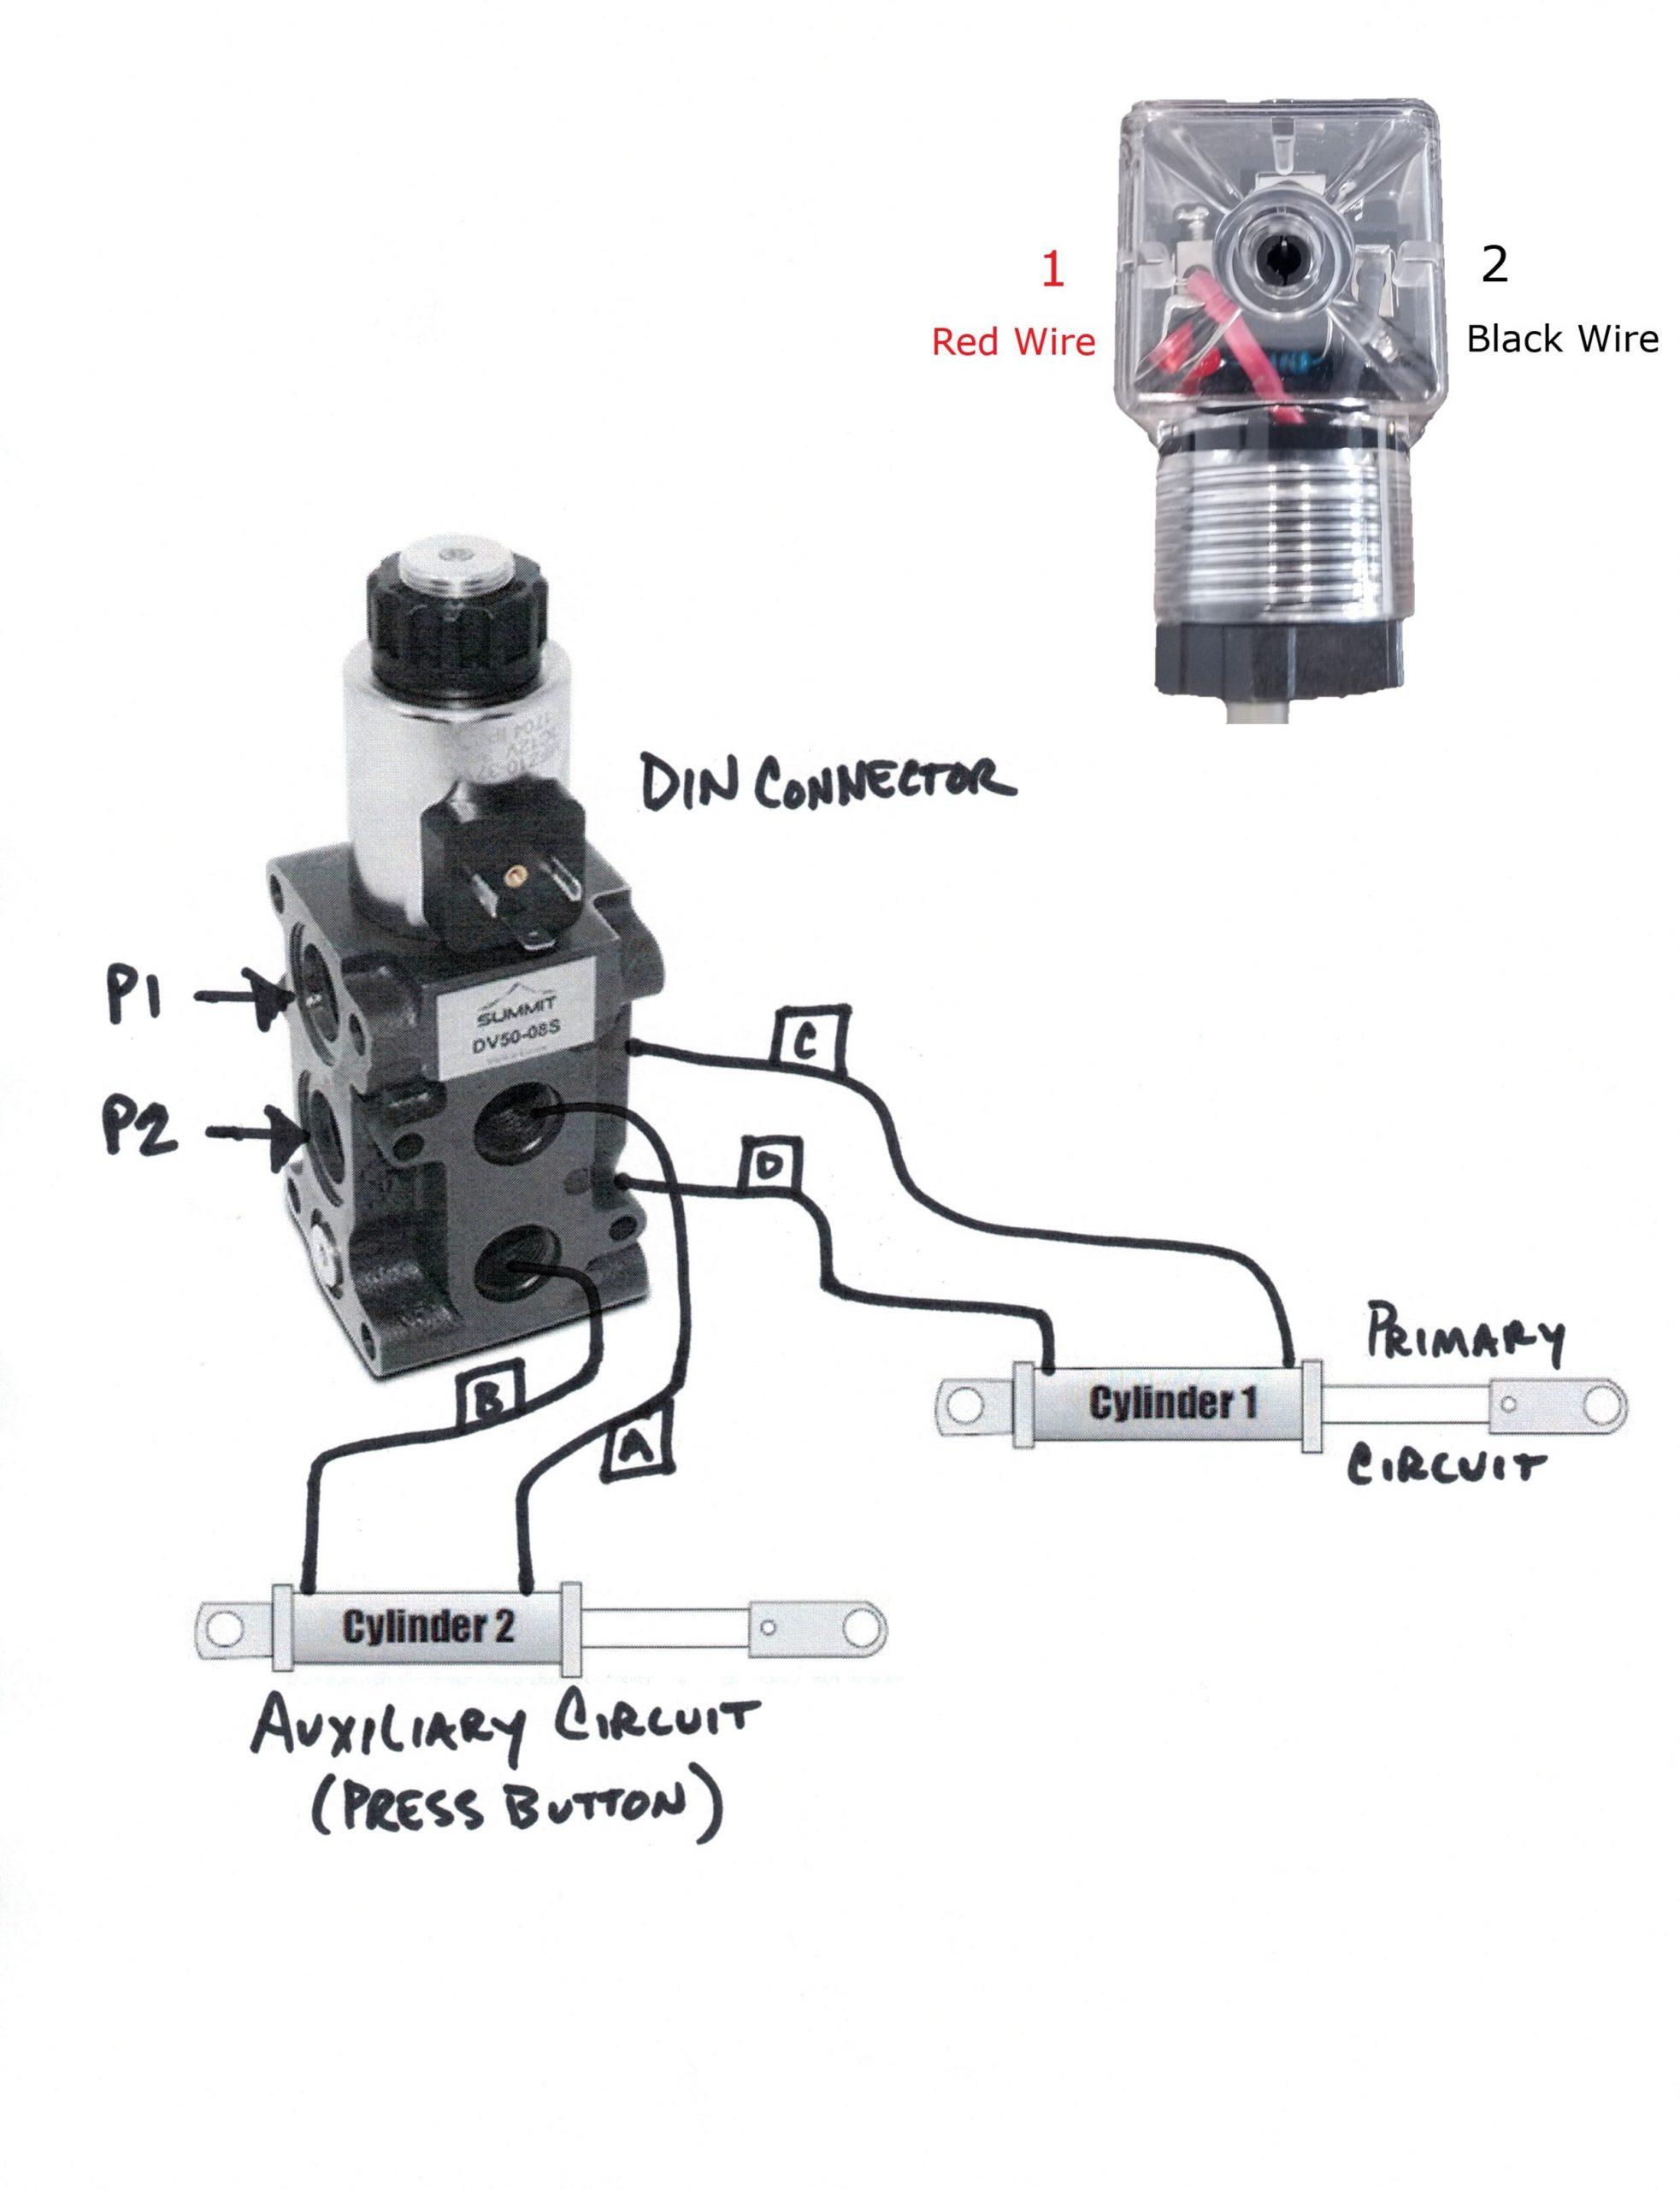 Hydraulic Solenoid Selector DV50 Instruction Diagram - Summit Hydraulics | Hydraulic Solenoid Valve Wiring Diagram |  | Summit Hydraulics